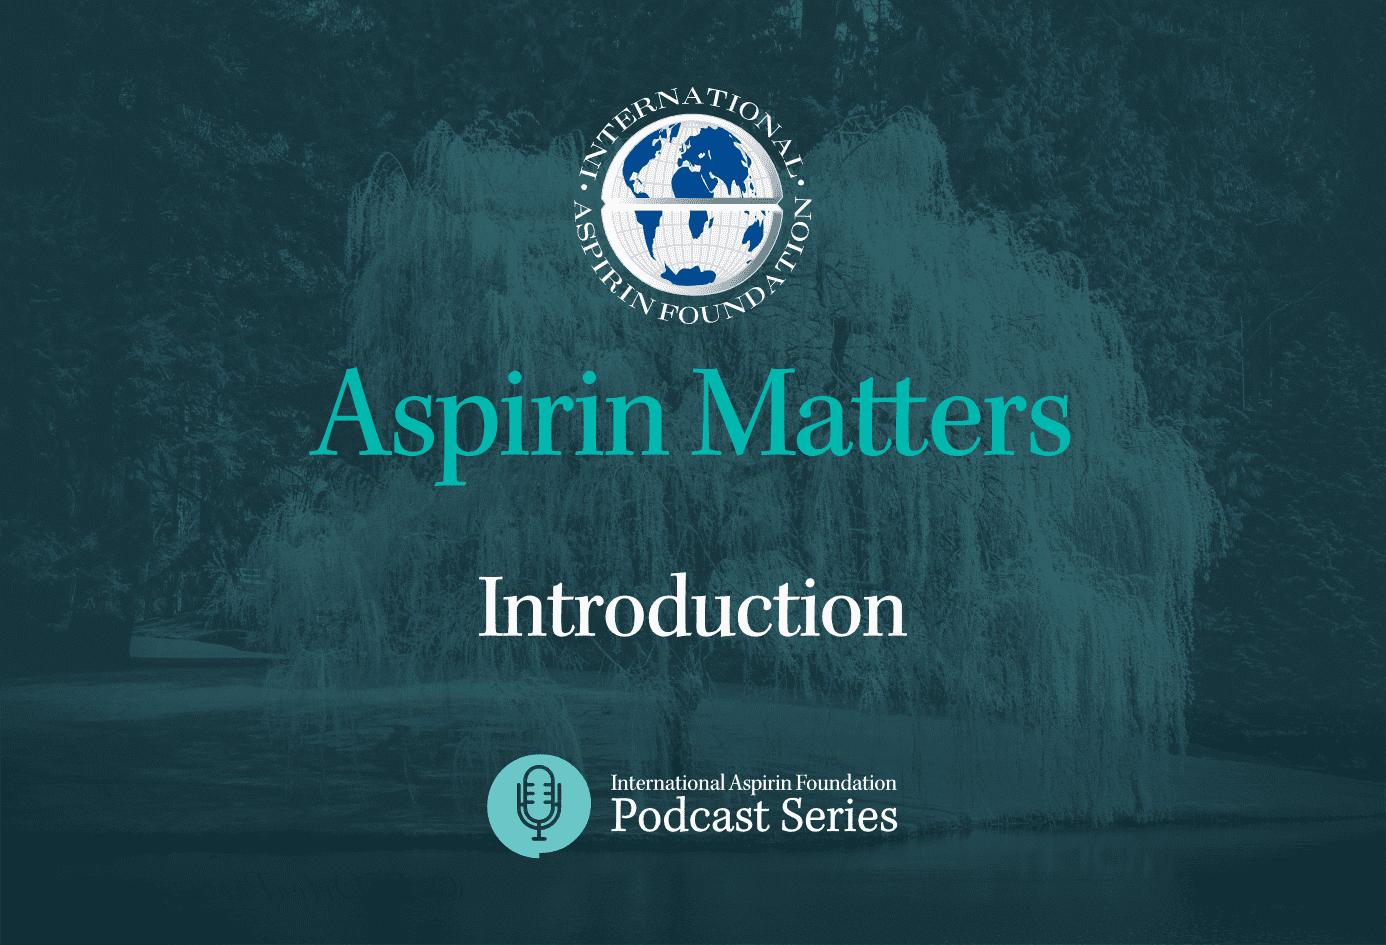 Aspirin Matter Podcasts 110221 Page 1